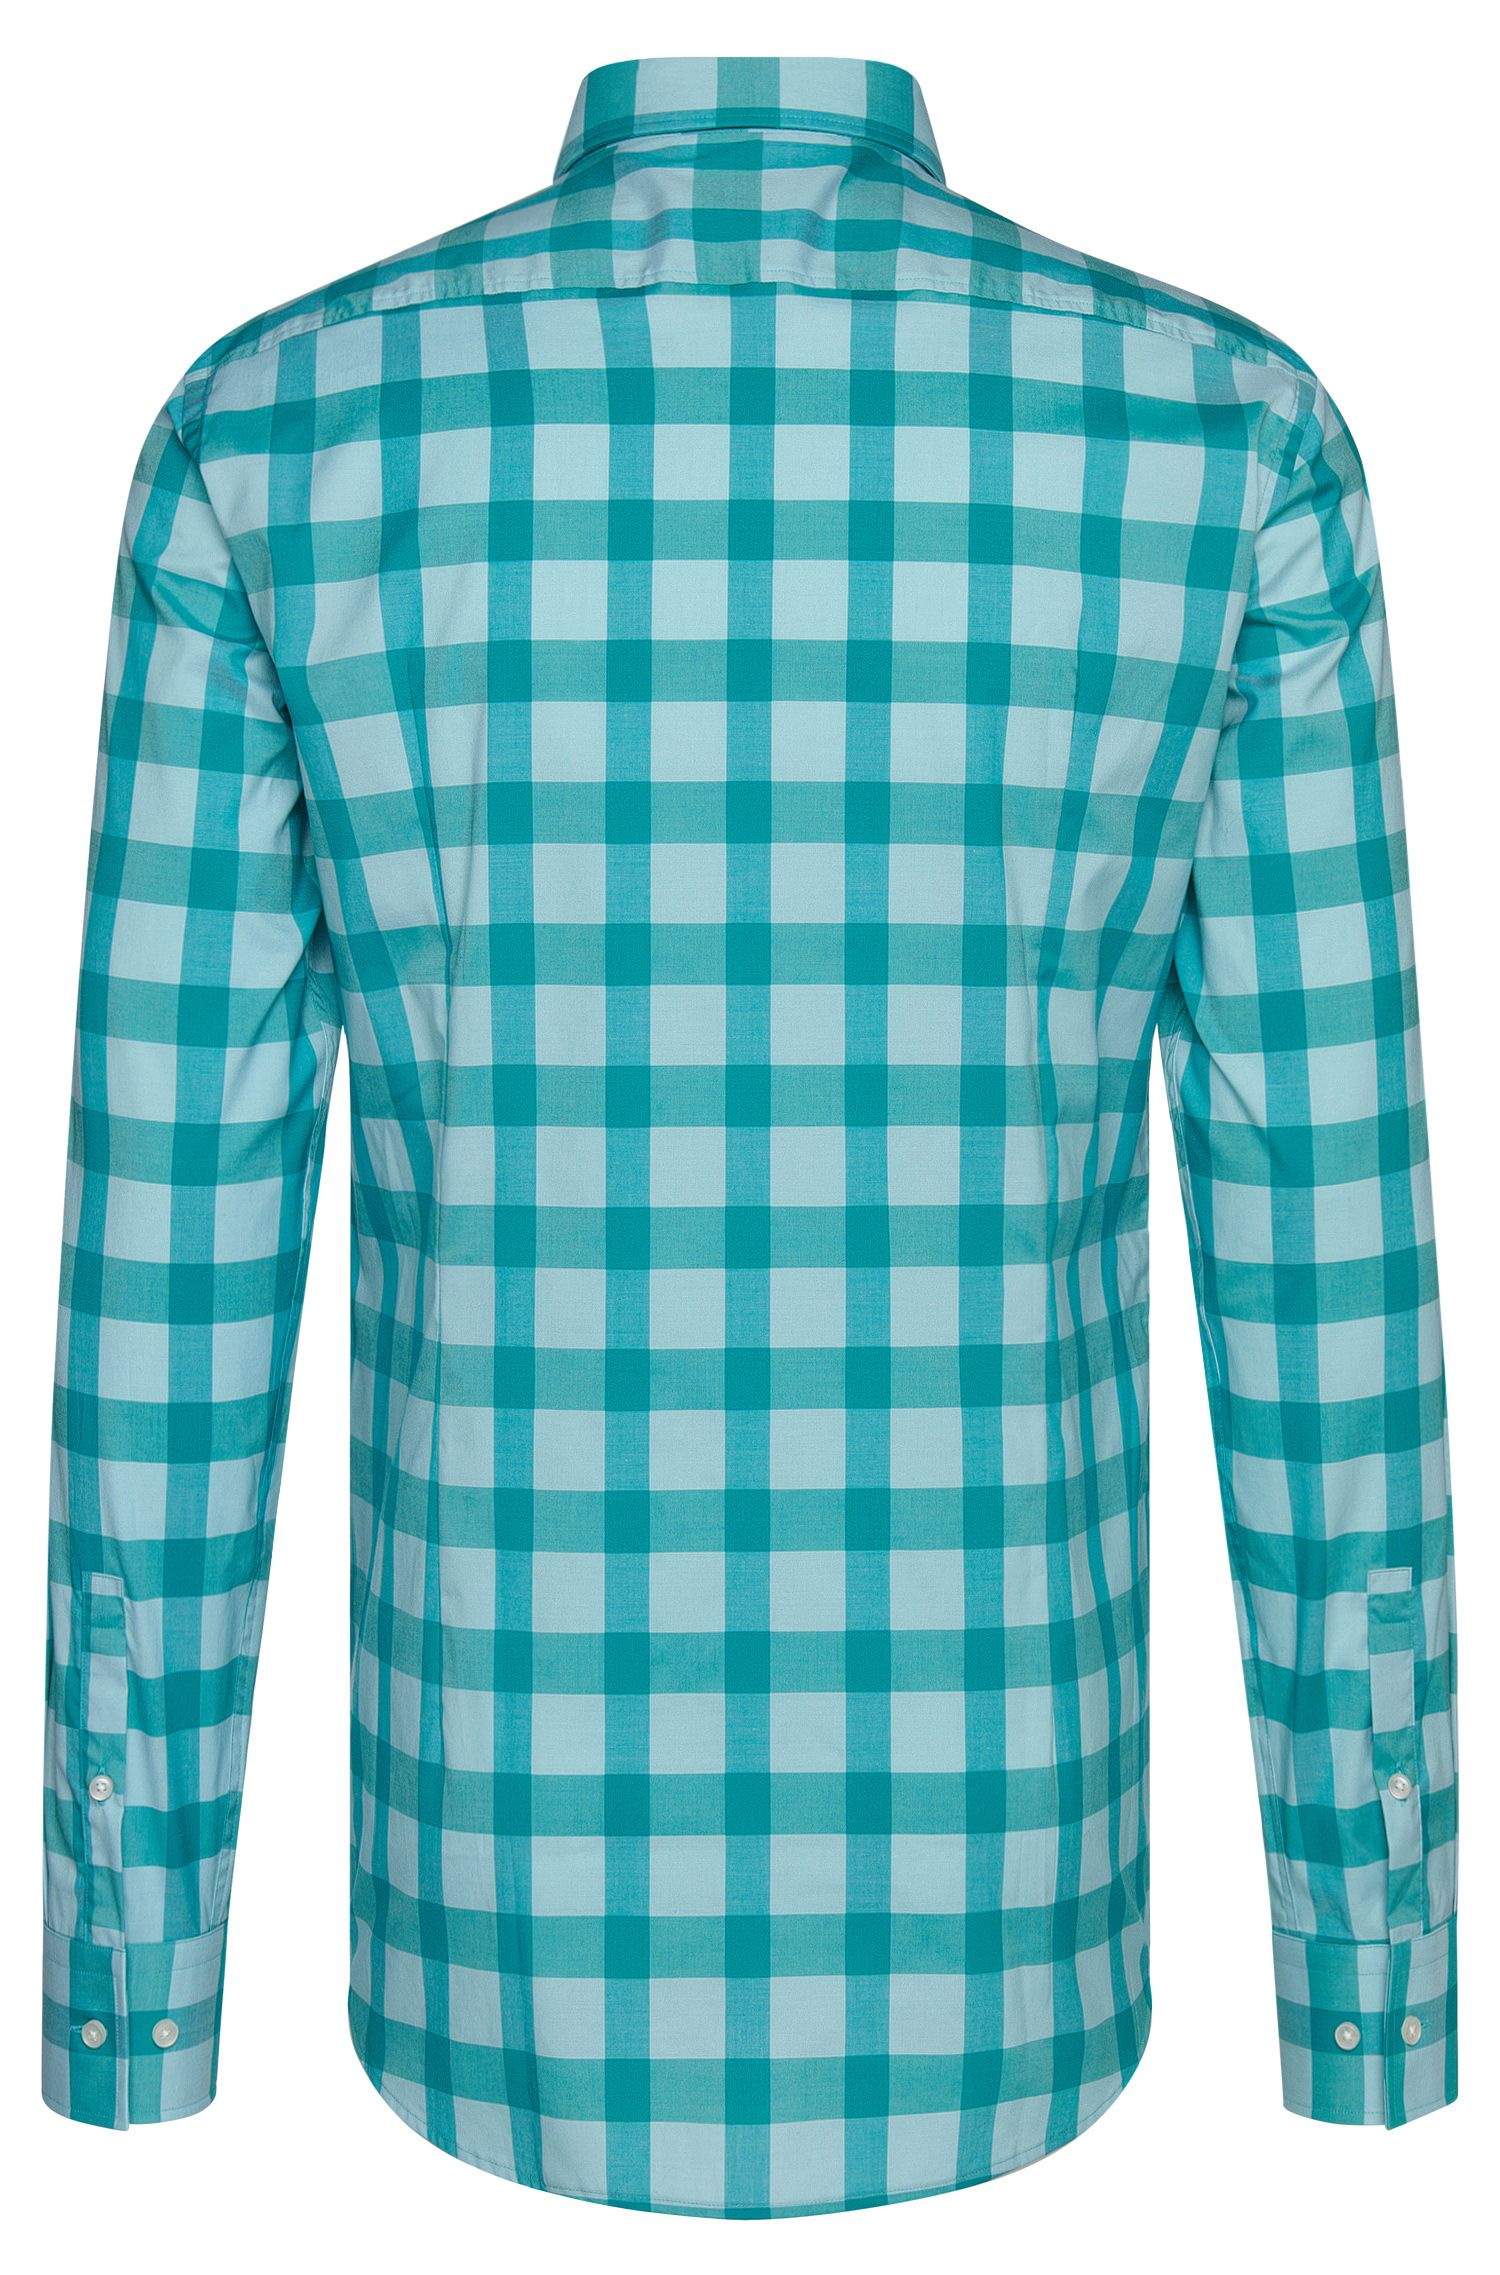 Buffalo Check Cotton Easy Iron Dress Shirt, Slim Fit   Jason, Open Green